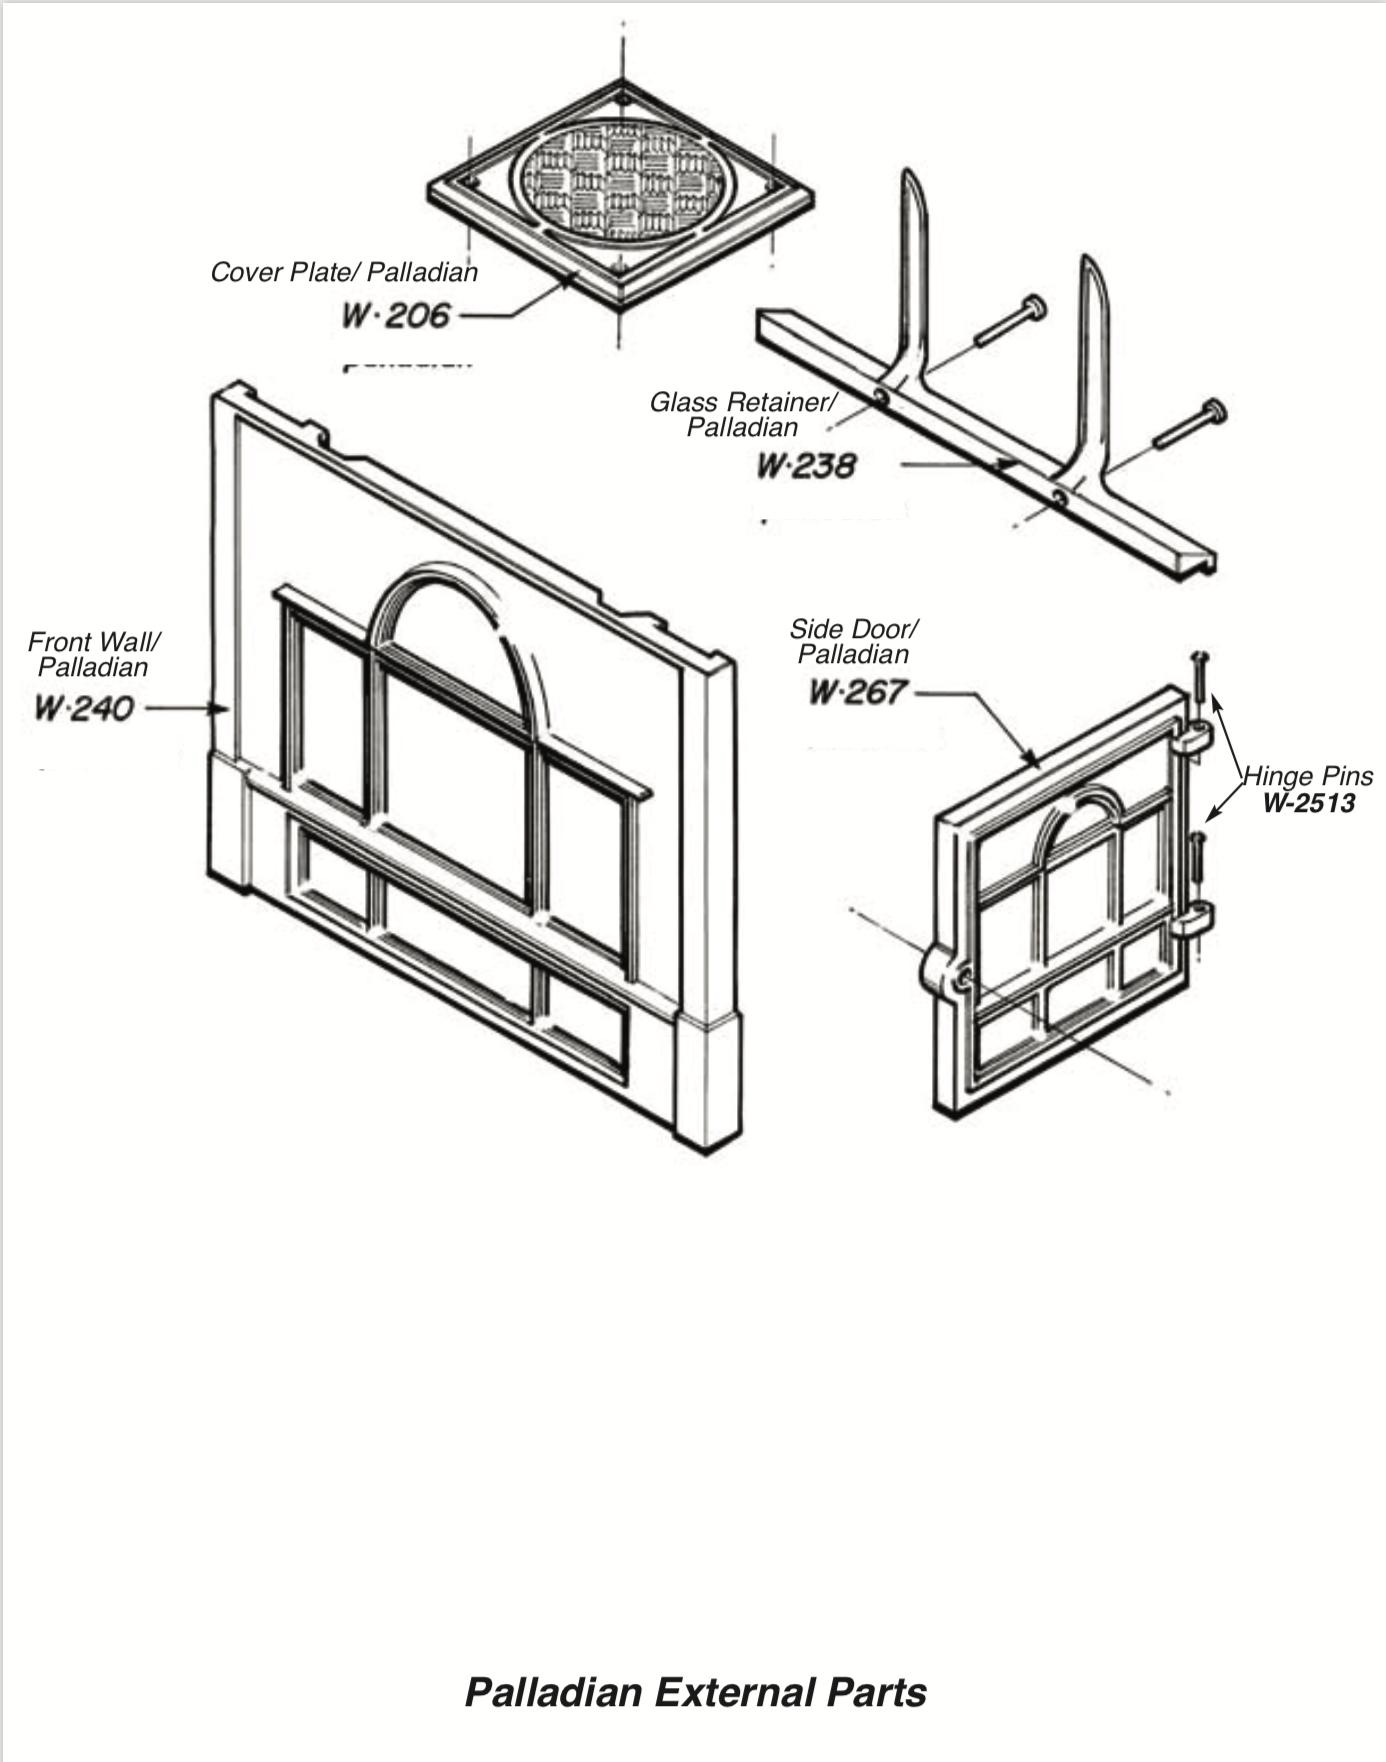 Palladian External Parts